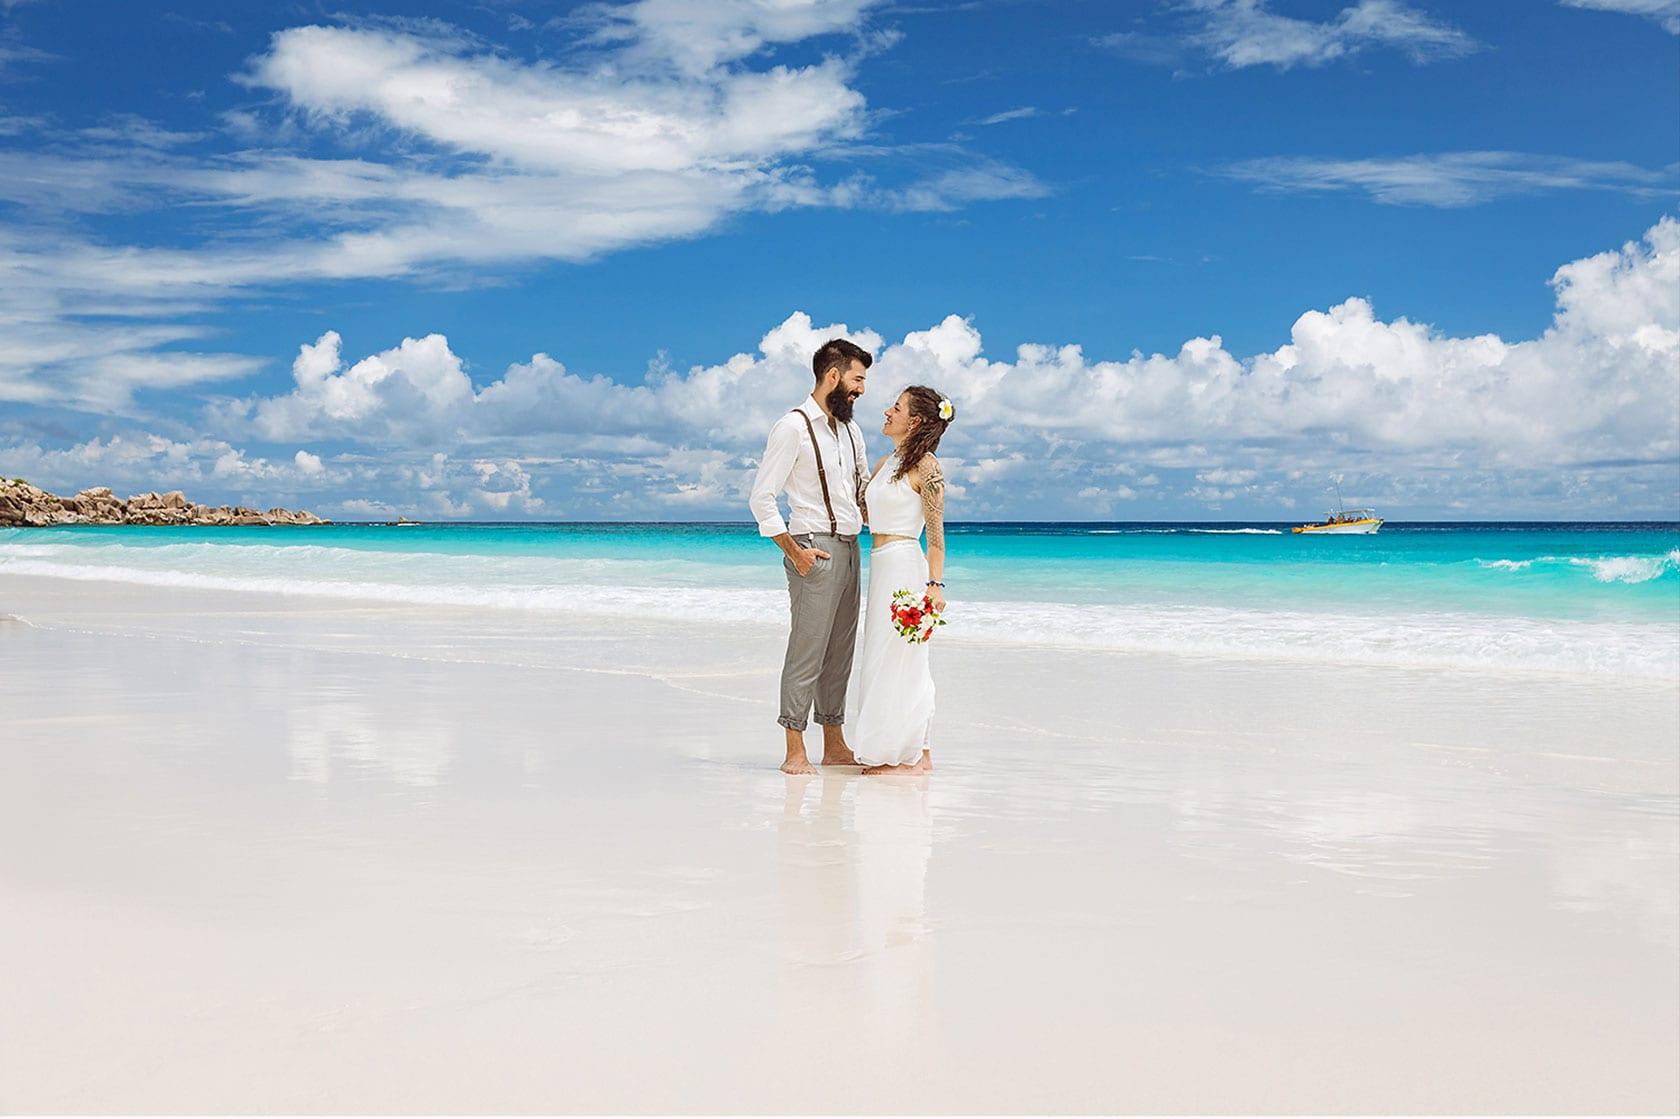 wedding seychelles contribution 2249